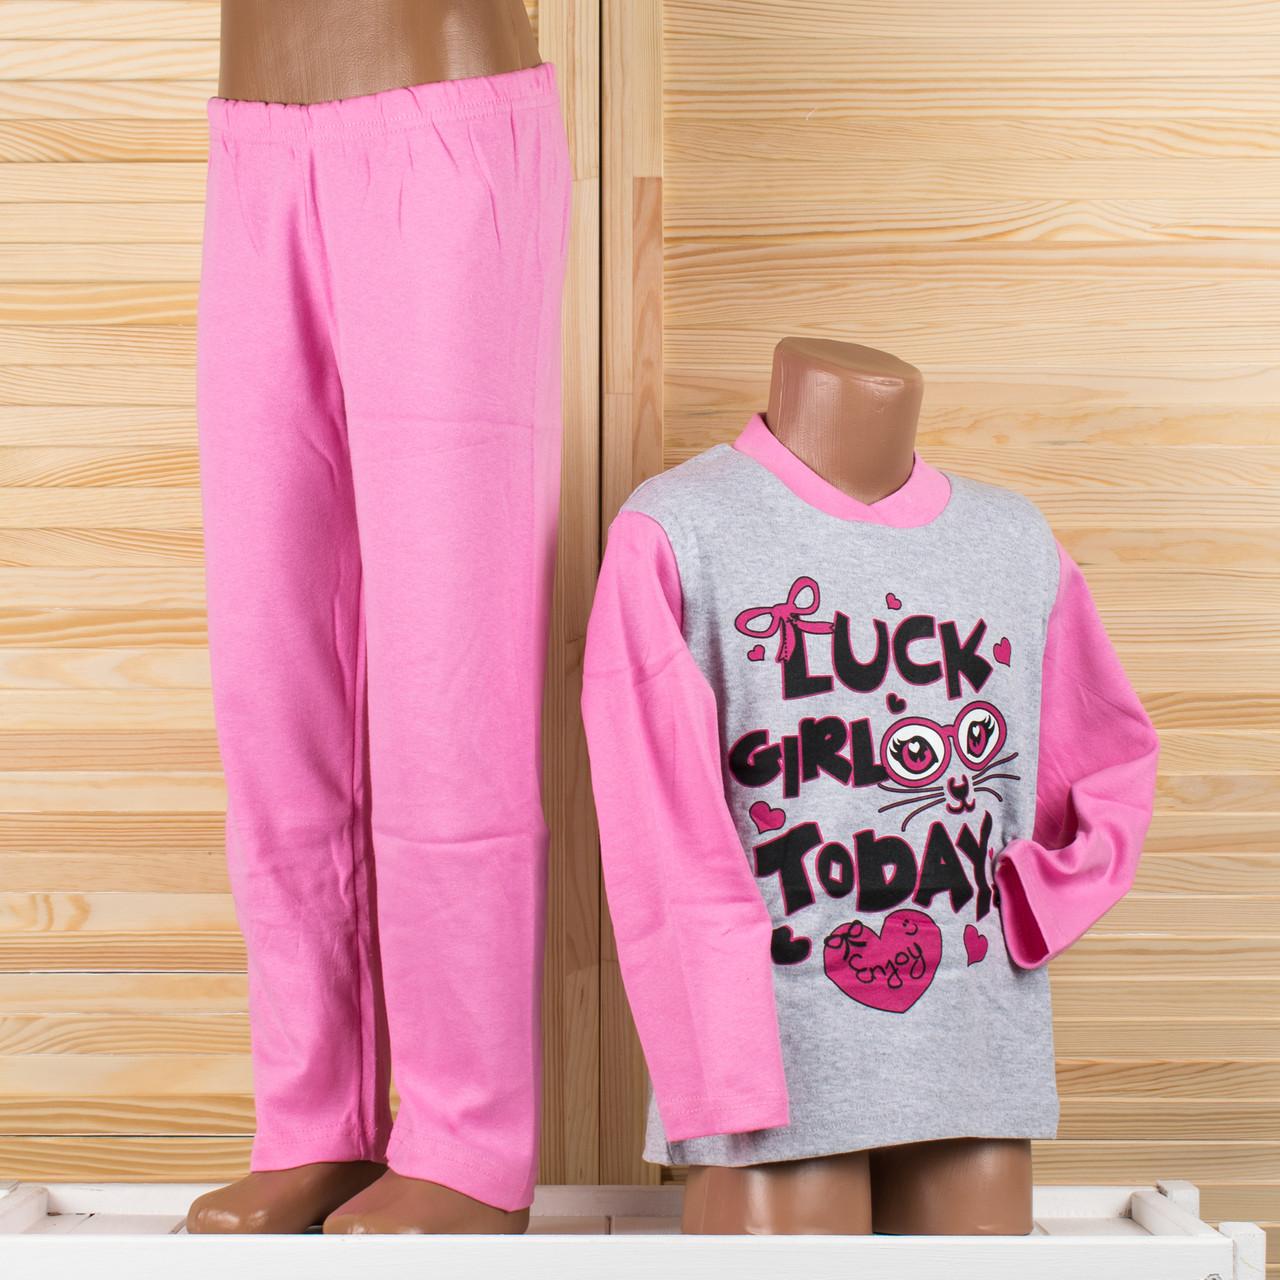 Детская пижама на девочку Турция. Moral 04-4 2/3. Размер на 2/3 года.